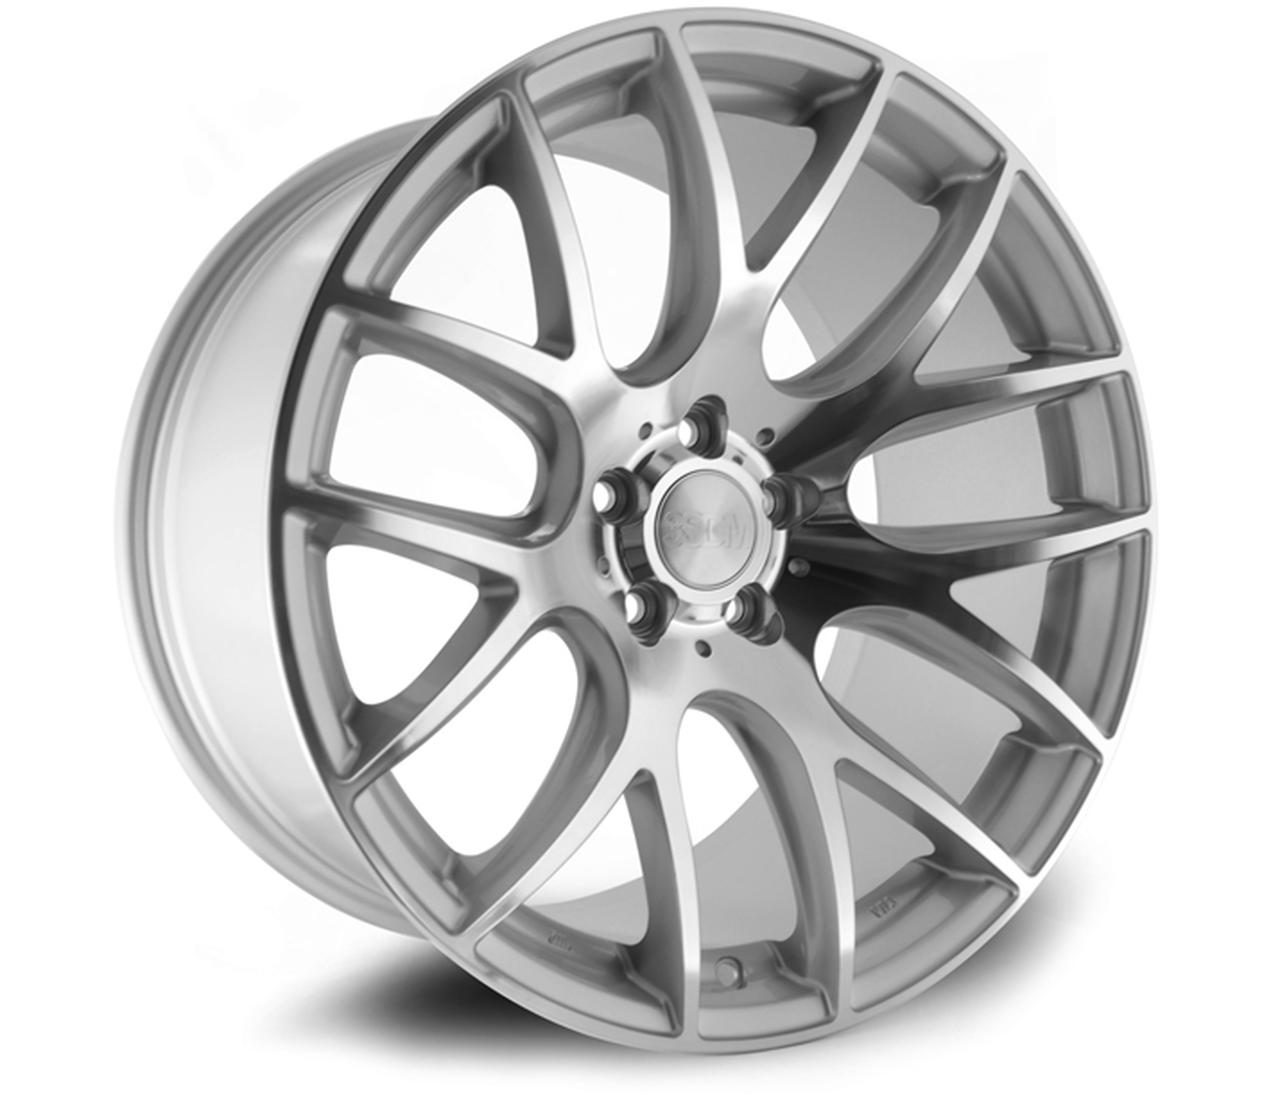 3SDM_Wheel_001_Silver.jpg